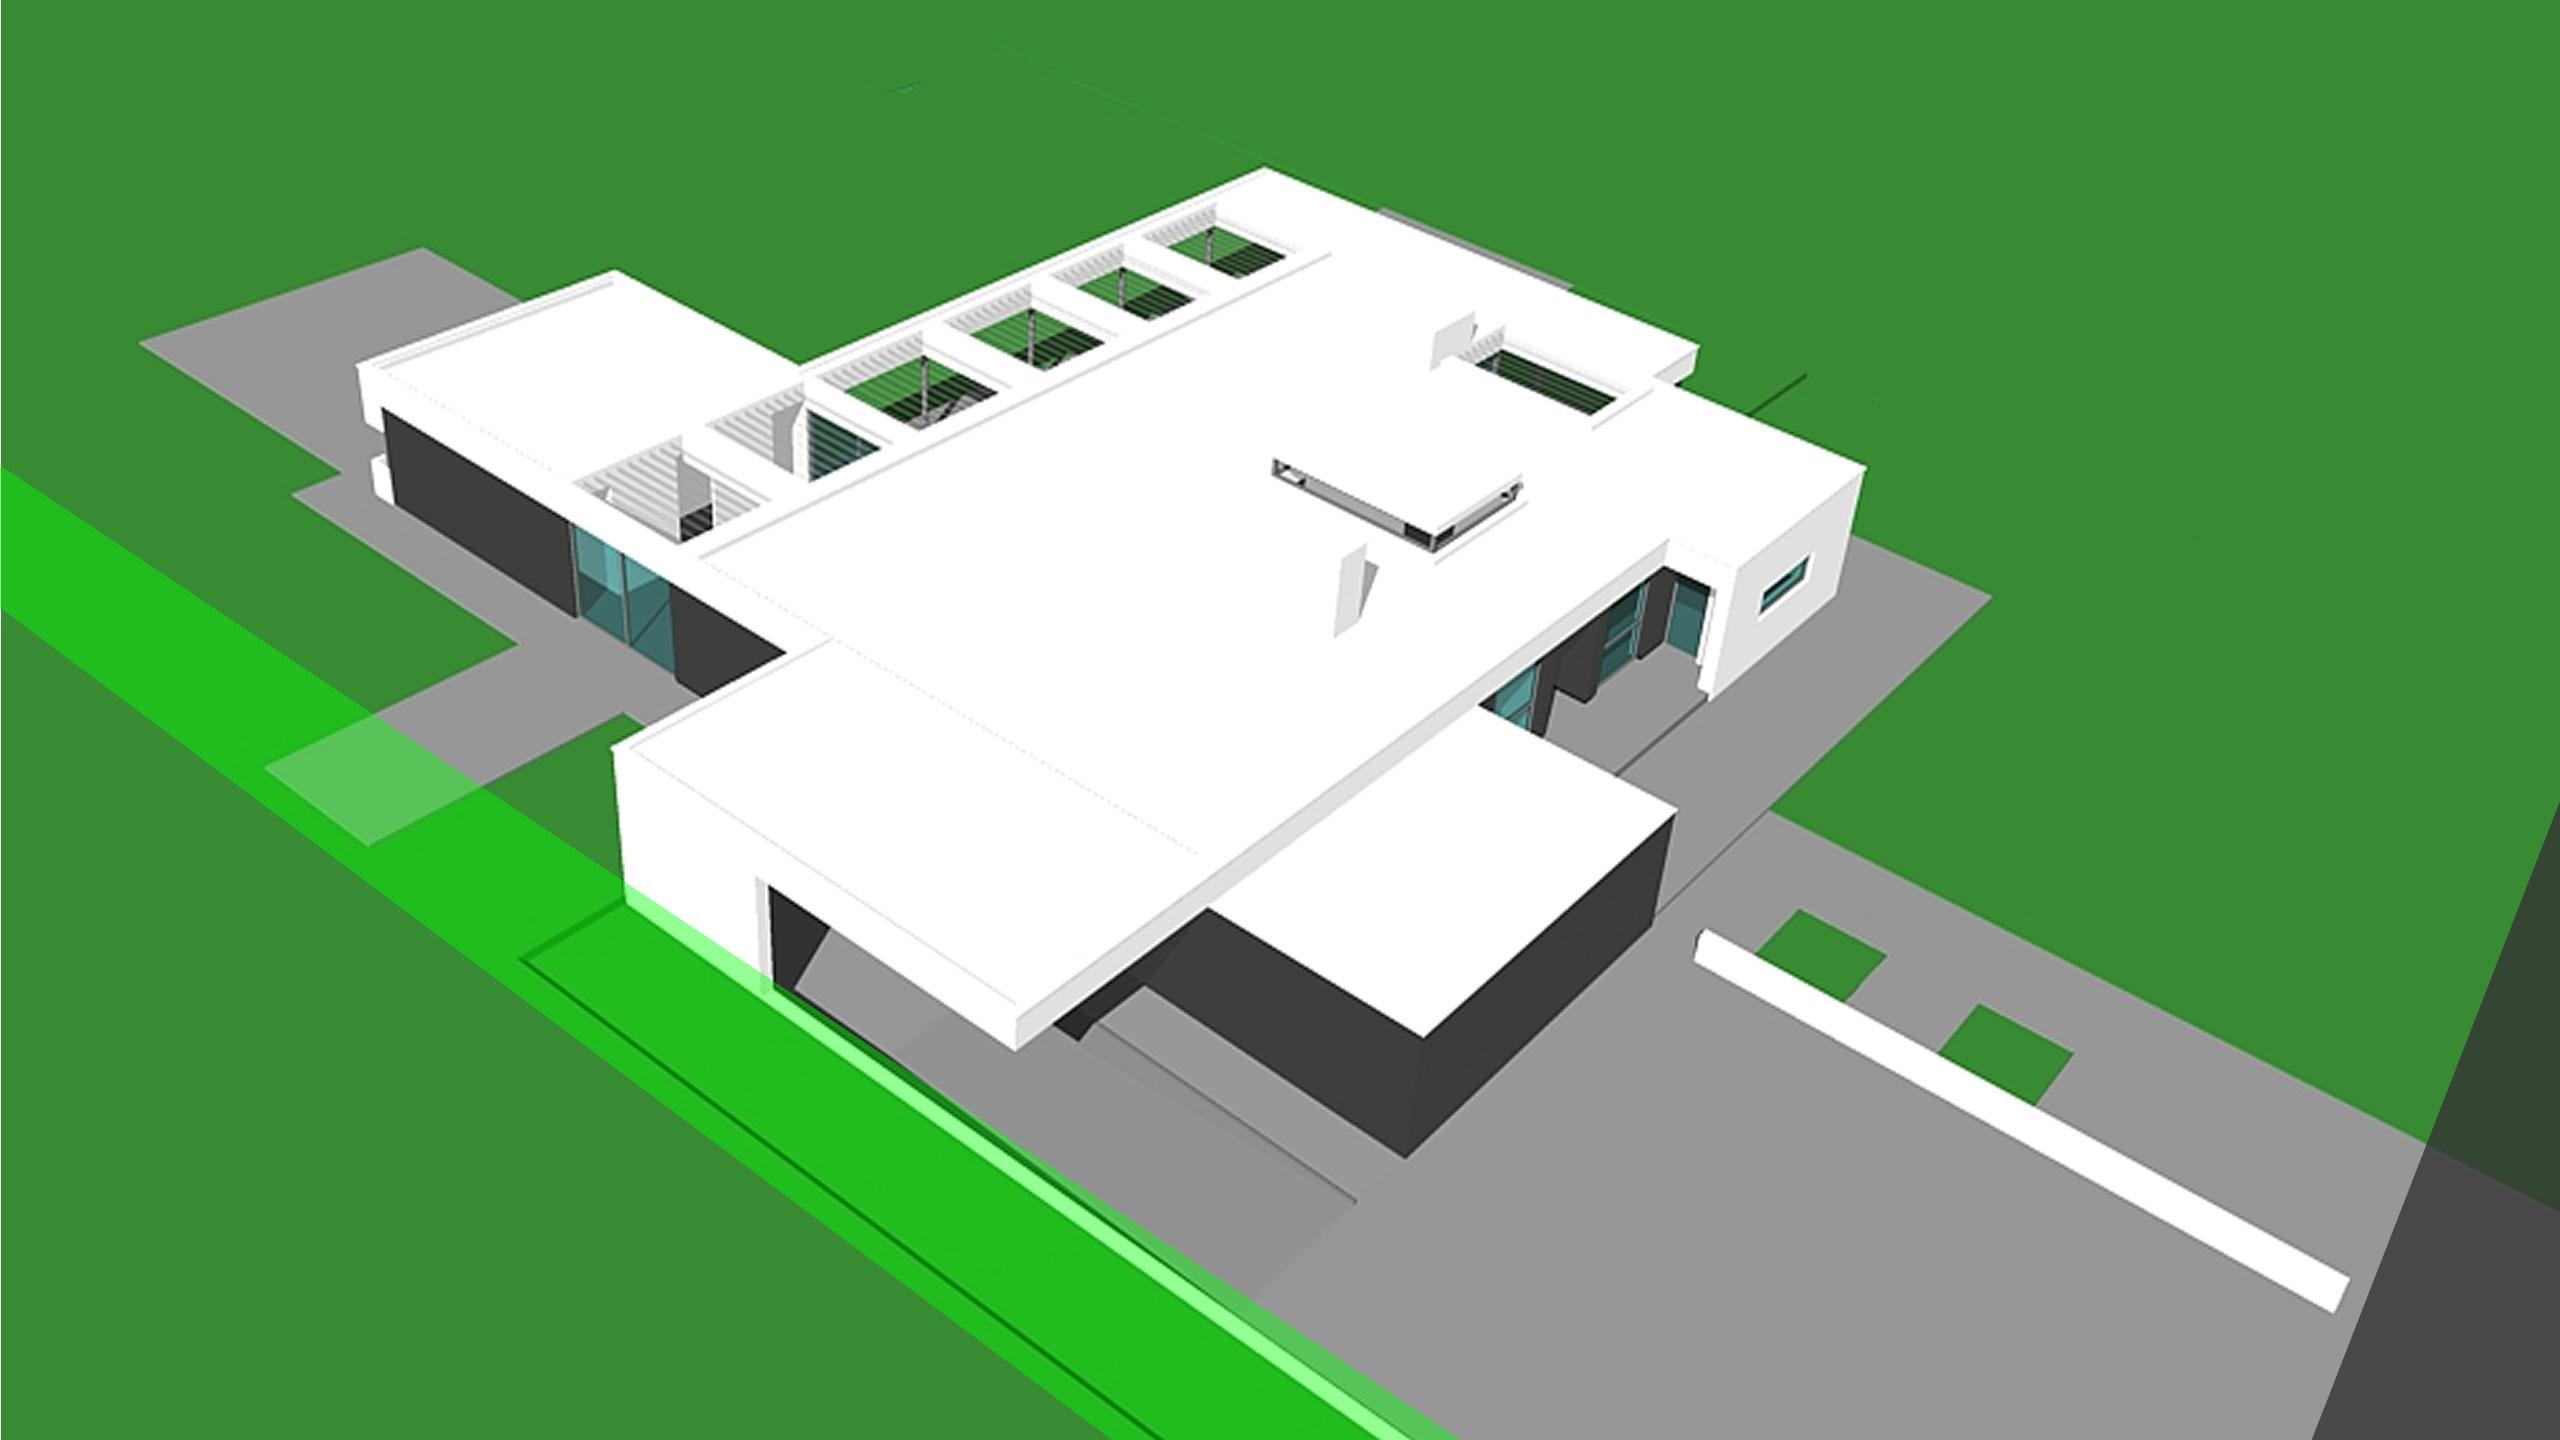 Villa spee in haelen netherlands by lab architects u sohomod